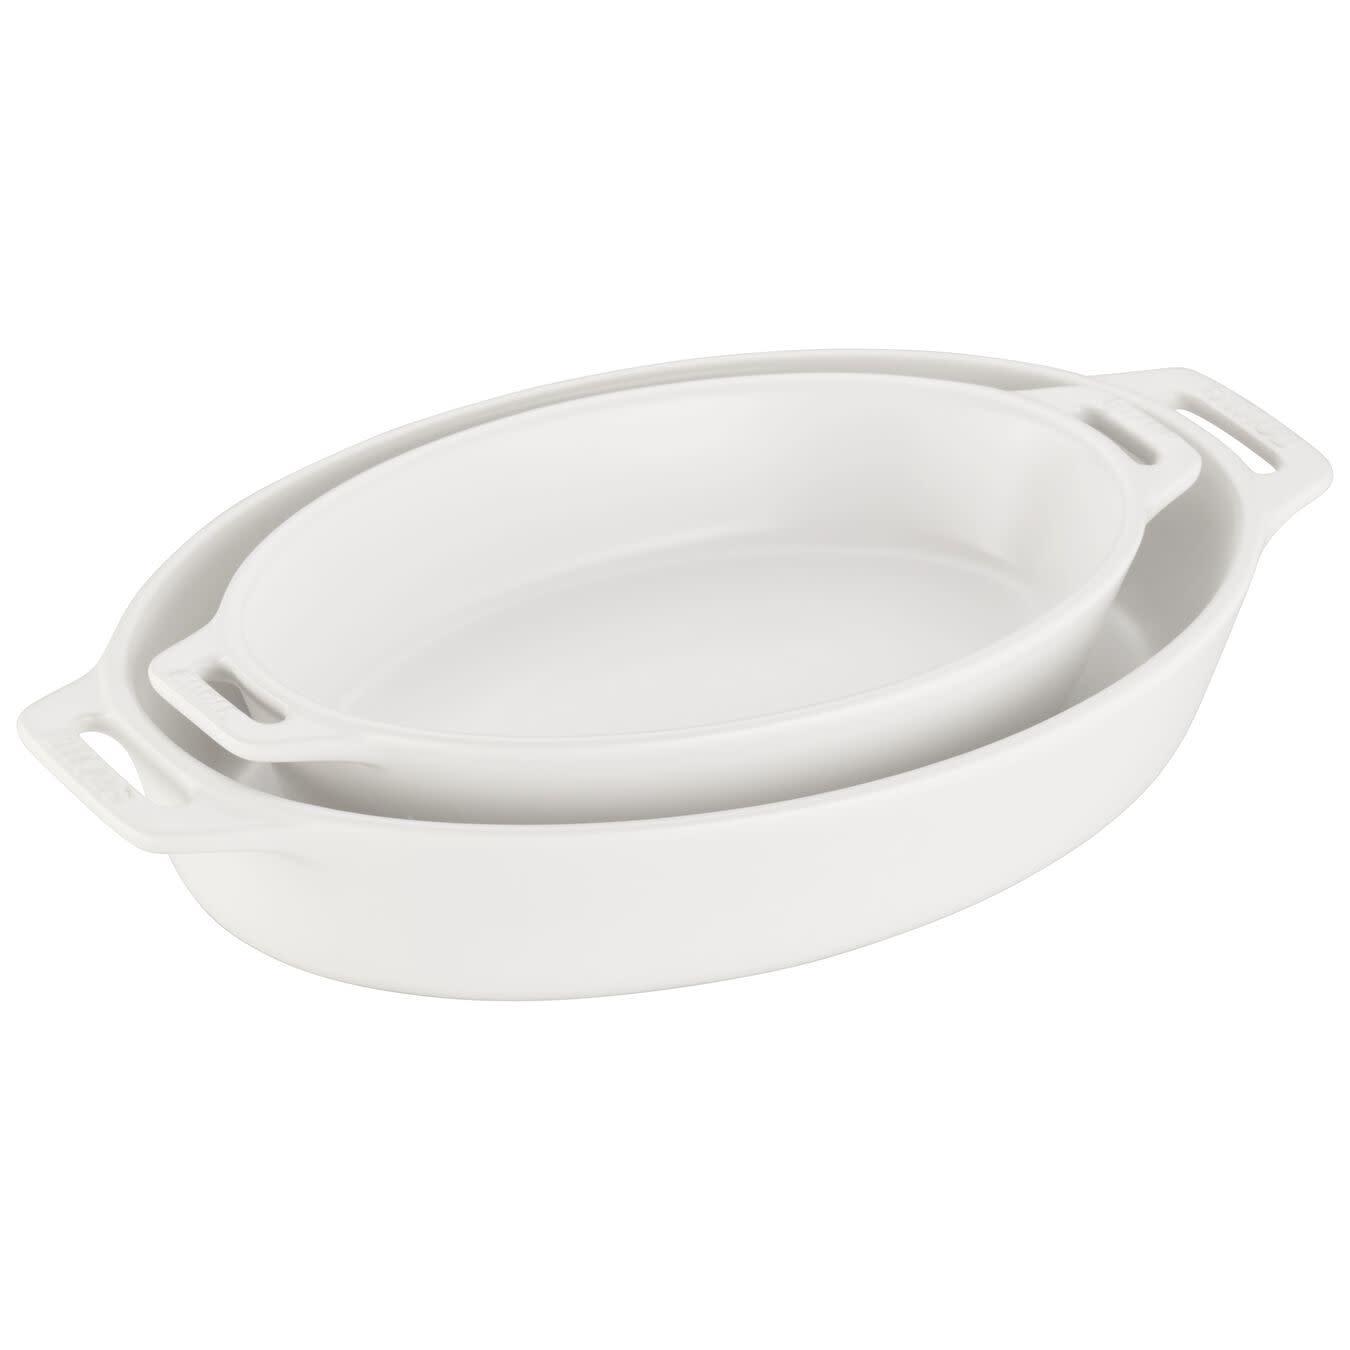 Staub Oval Dish Set 2pc Matte White